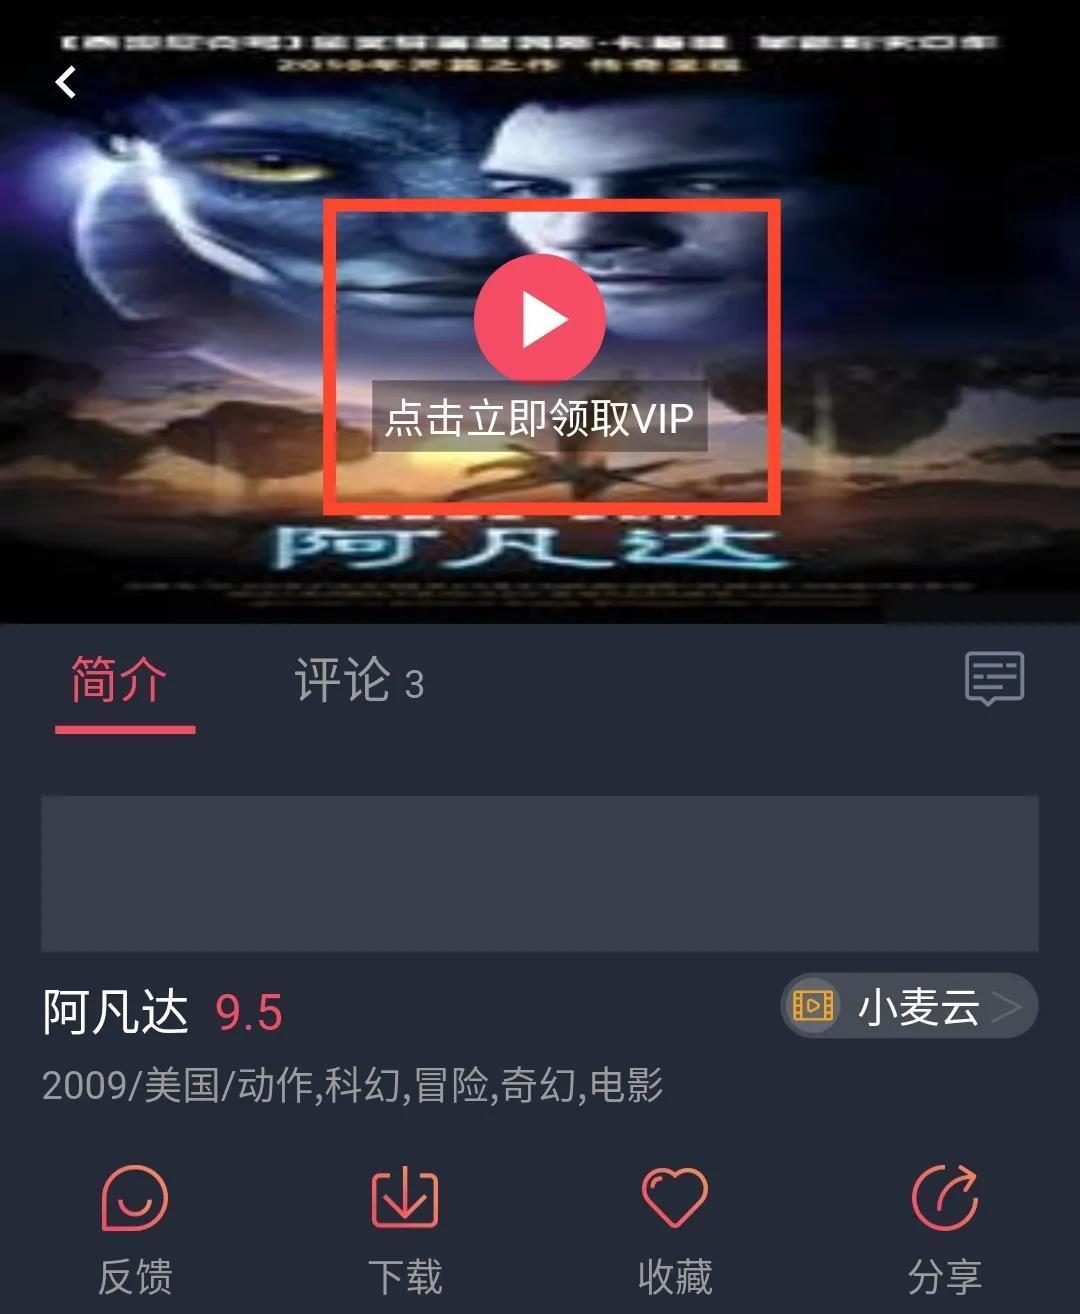 60c00cf5844ef46bb2594696 不用登录就可以观看视频,领取VIP免费观看--柚子影视